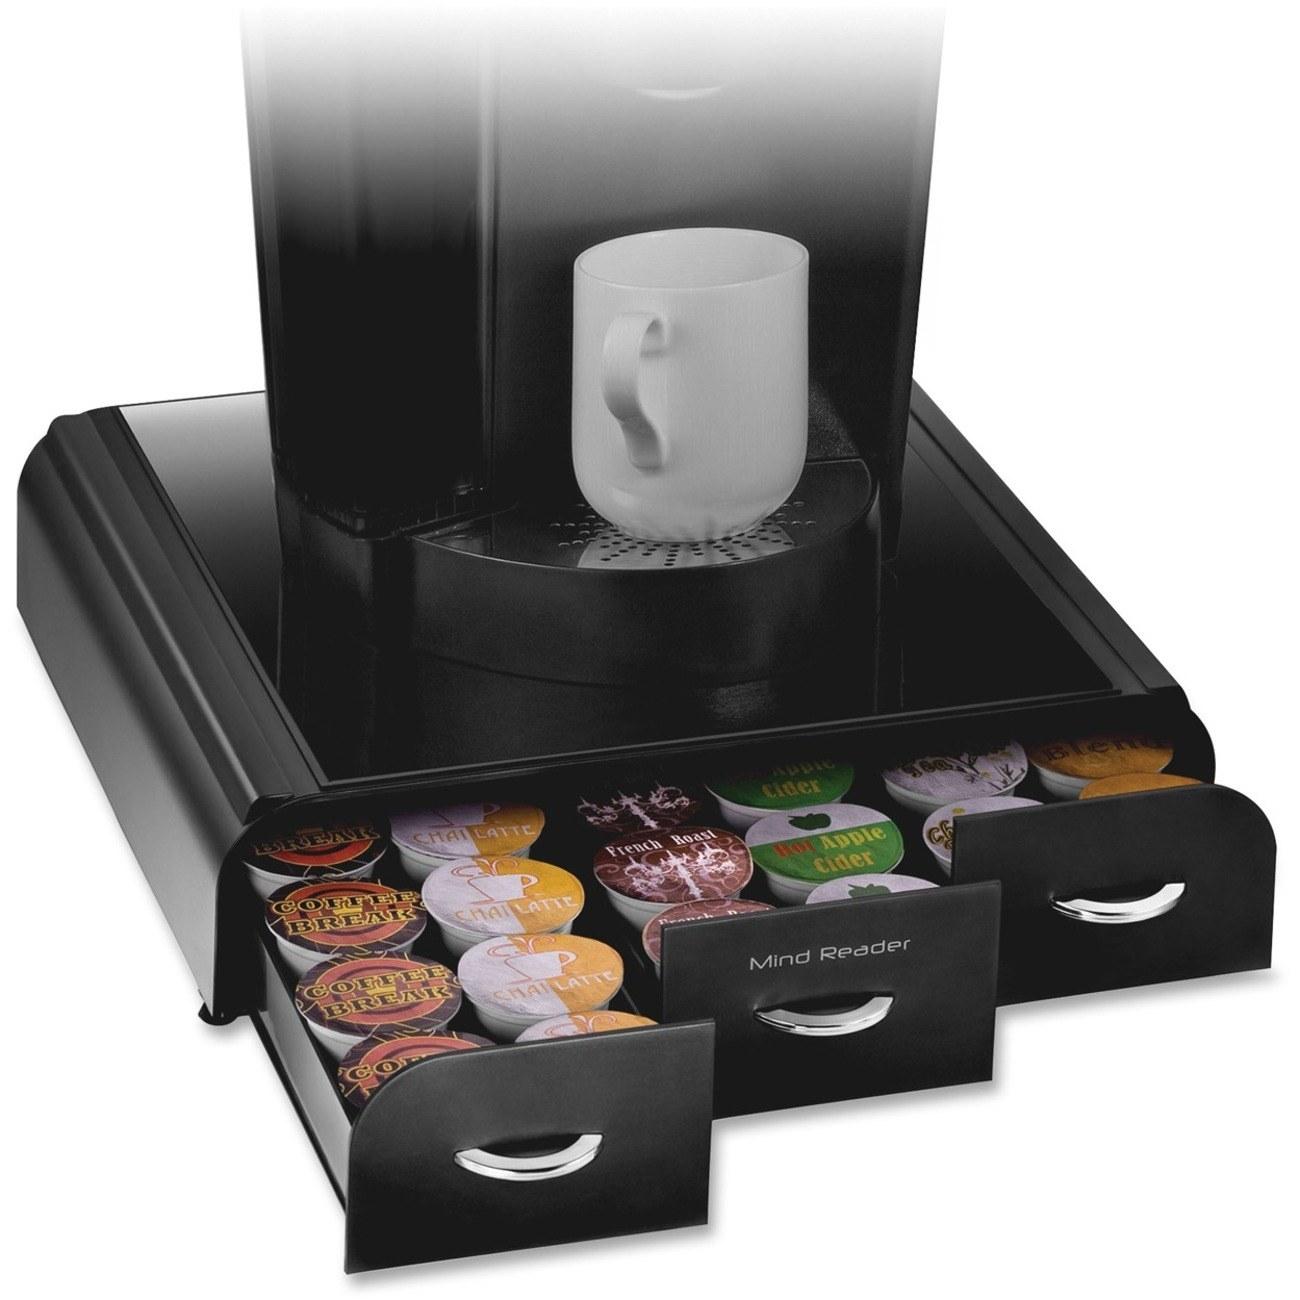 A slide out pod drawer full of pods under a Keurig machine